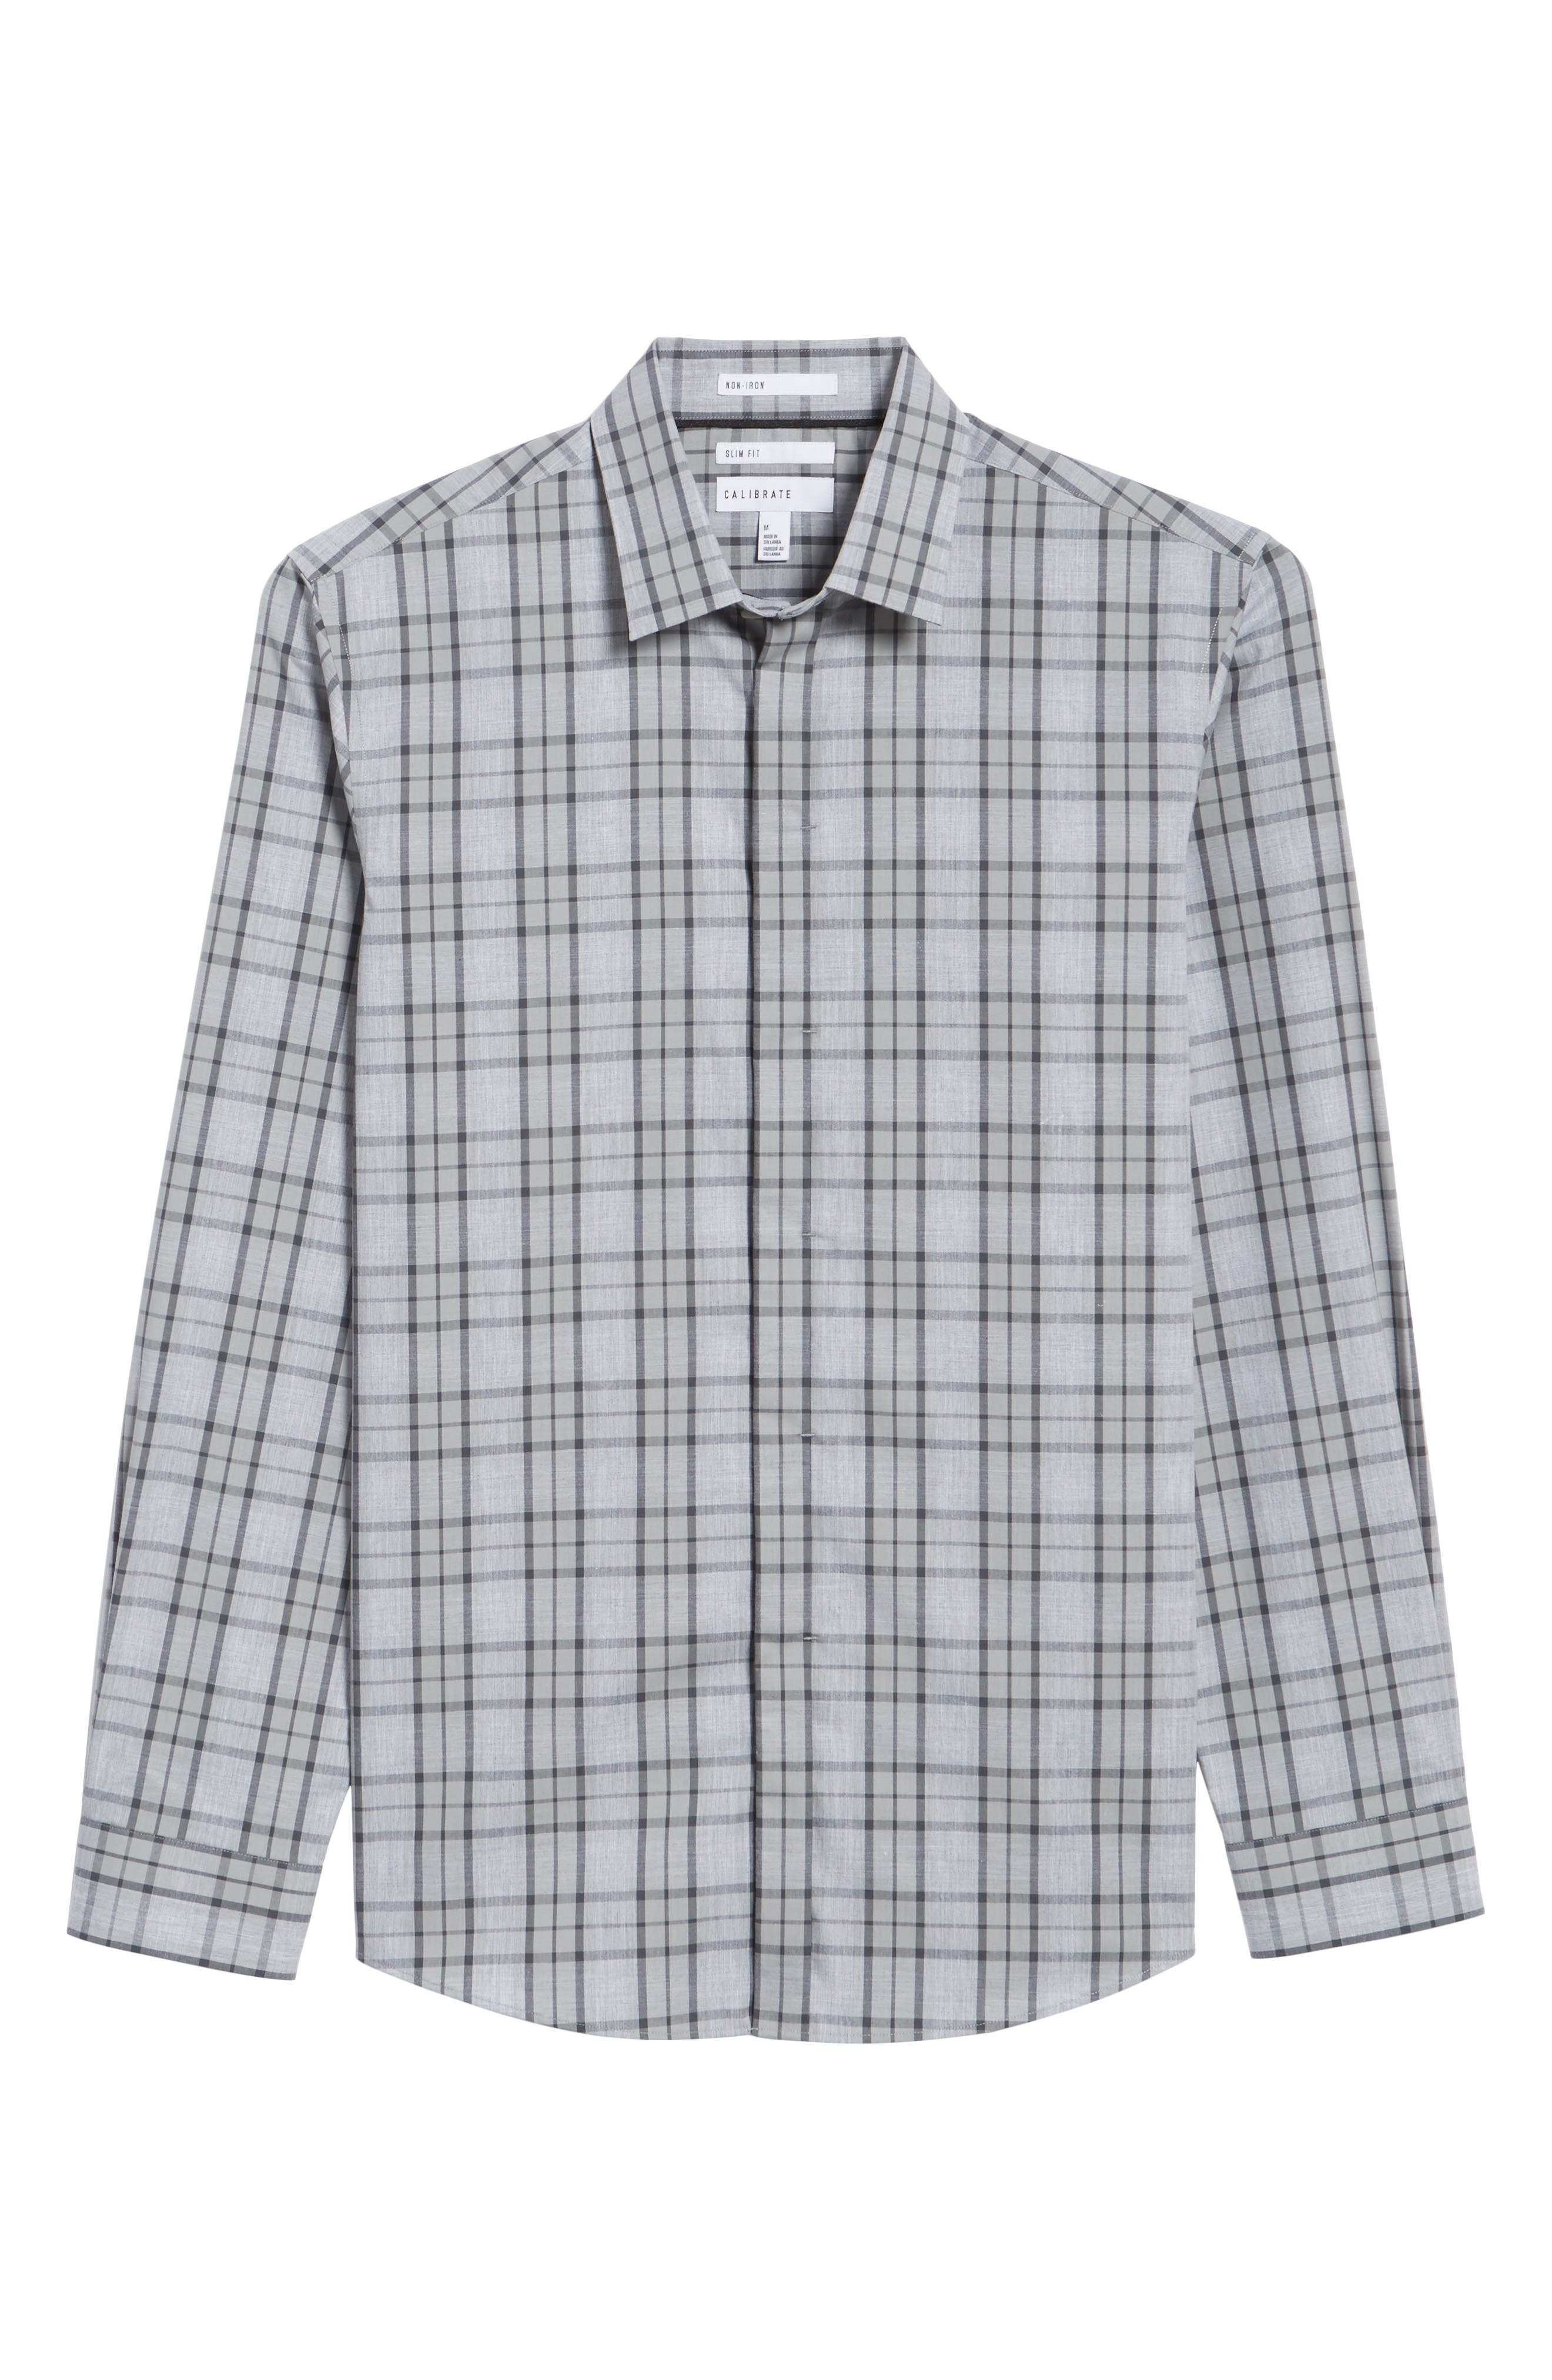 Trim Fit Plaid Sport Shirt,                             Alternate thumbnail 6, color,                             Grey Micro Heather Plaid